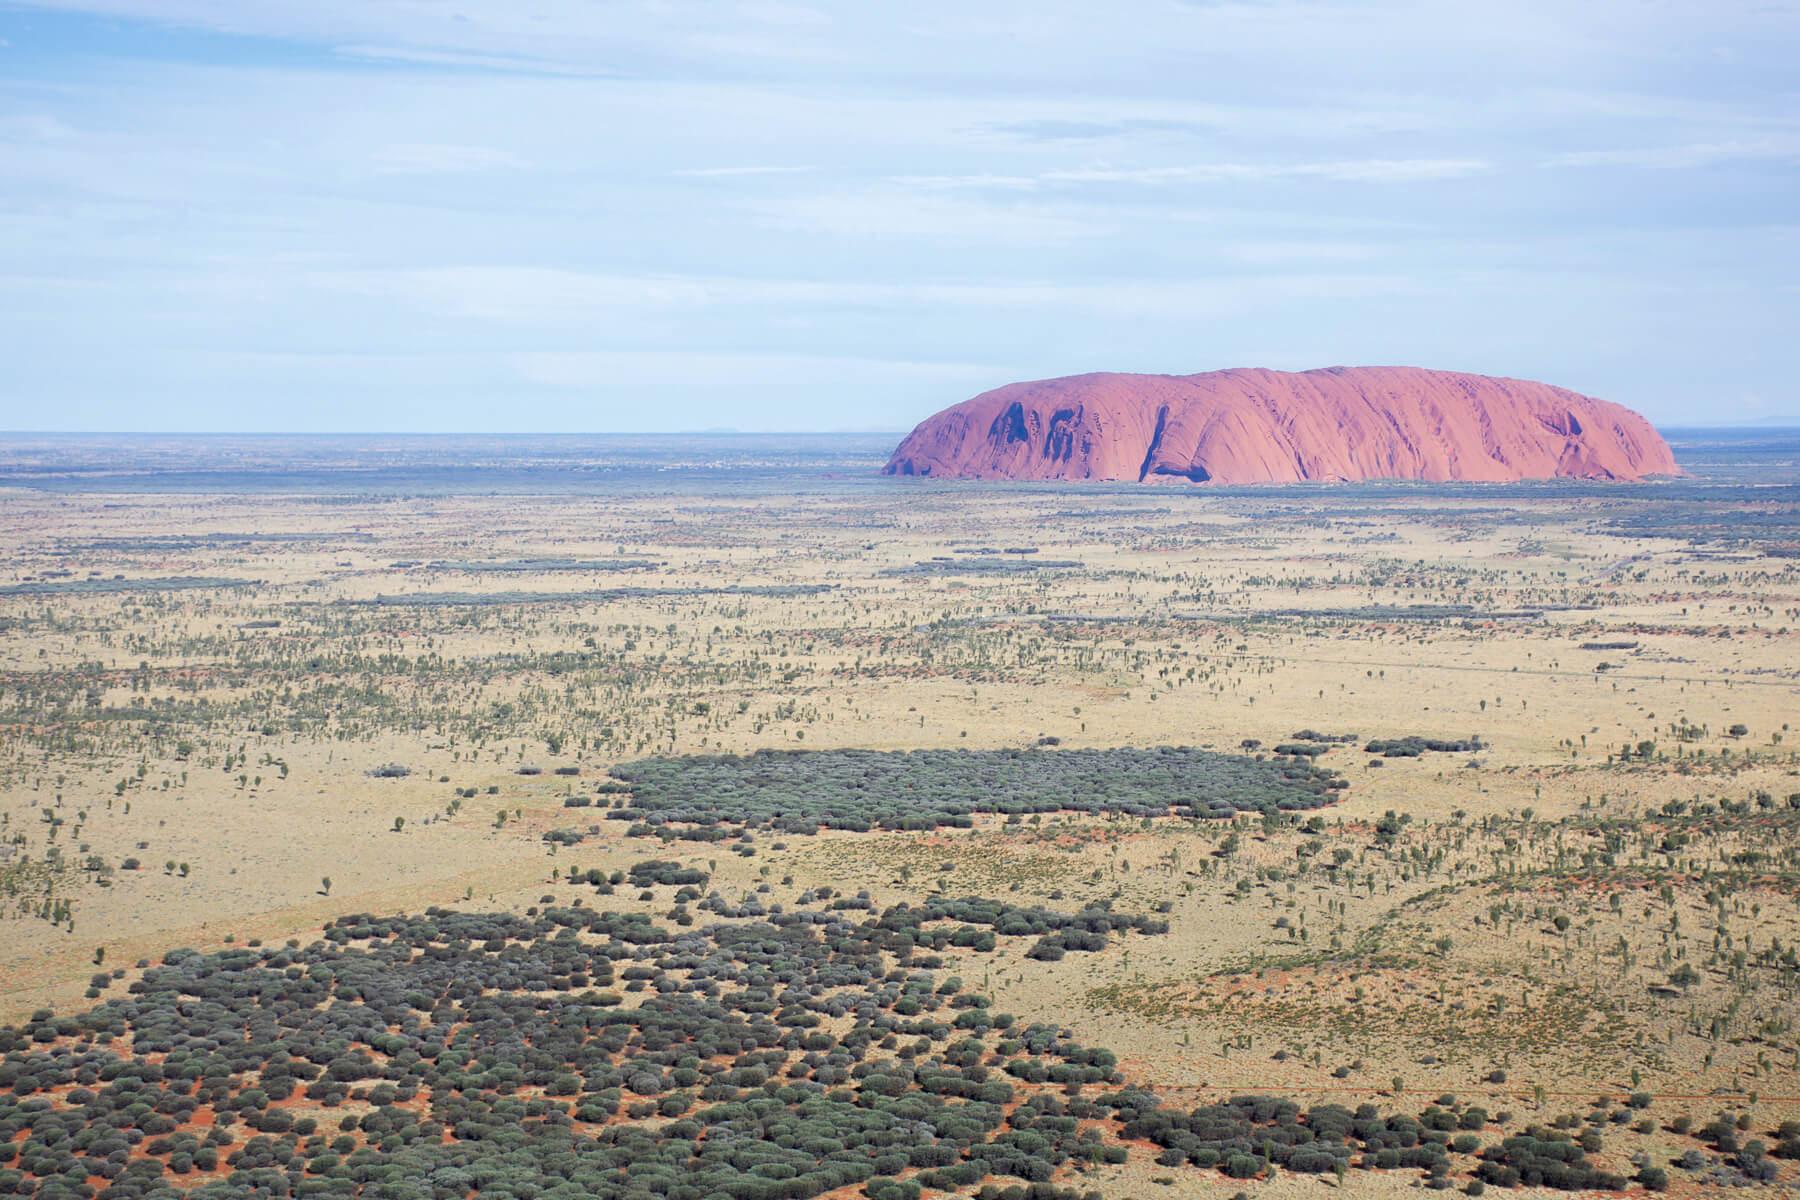 Sky view of Vibrant Uluru